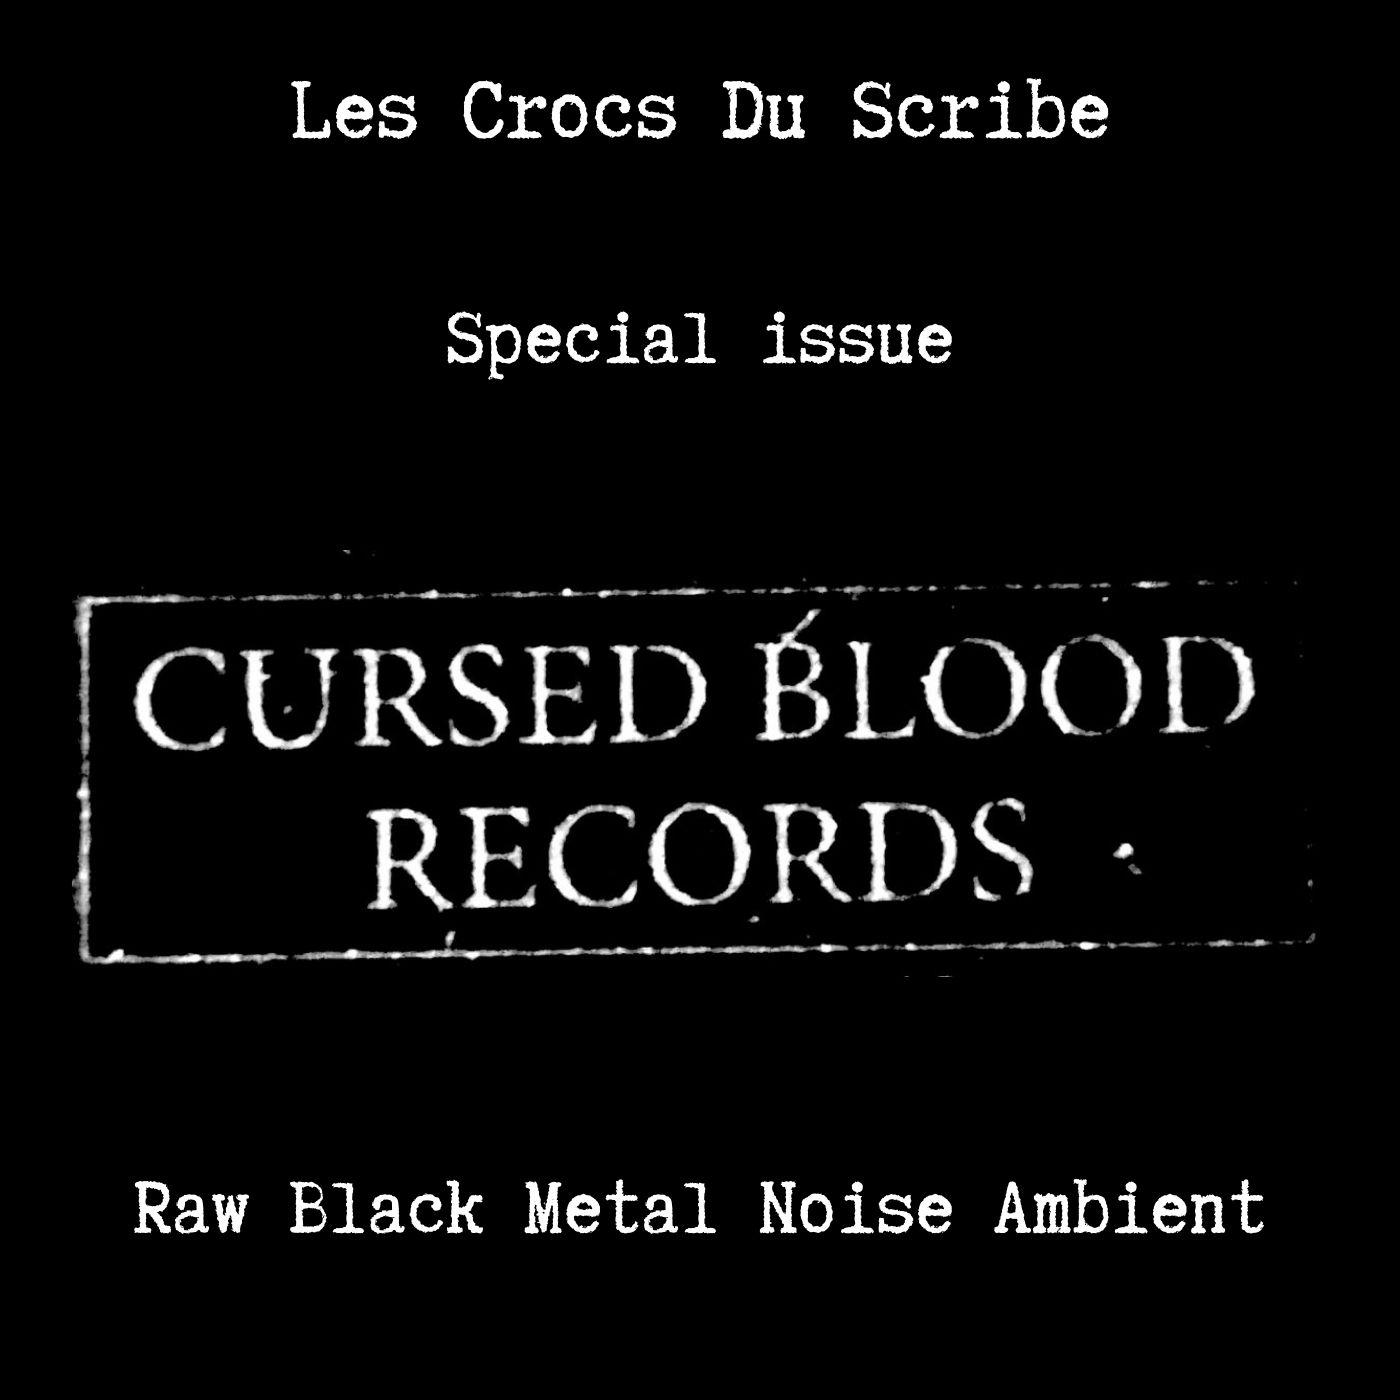 cursed blood records le scribe du rock reviews